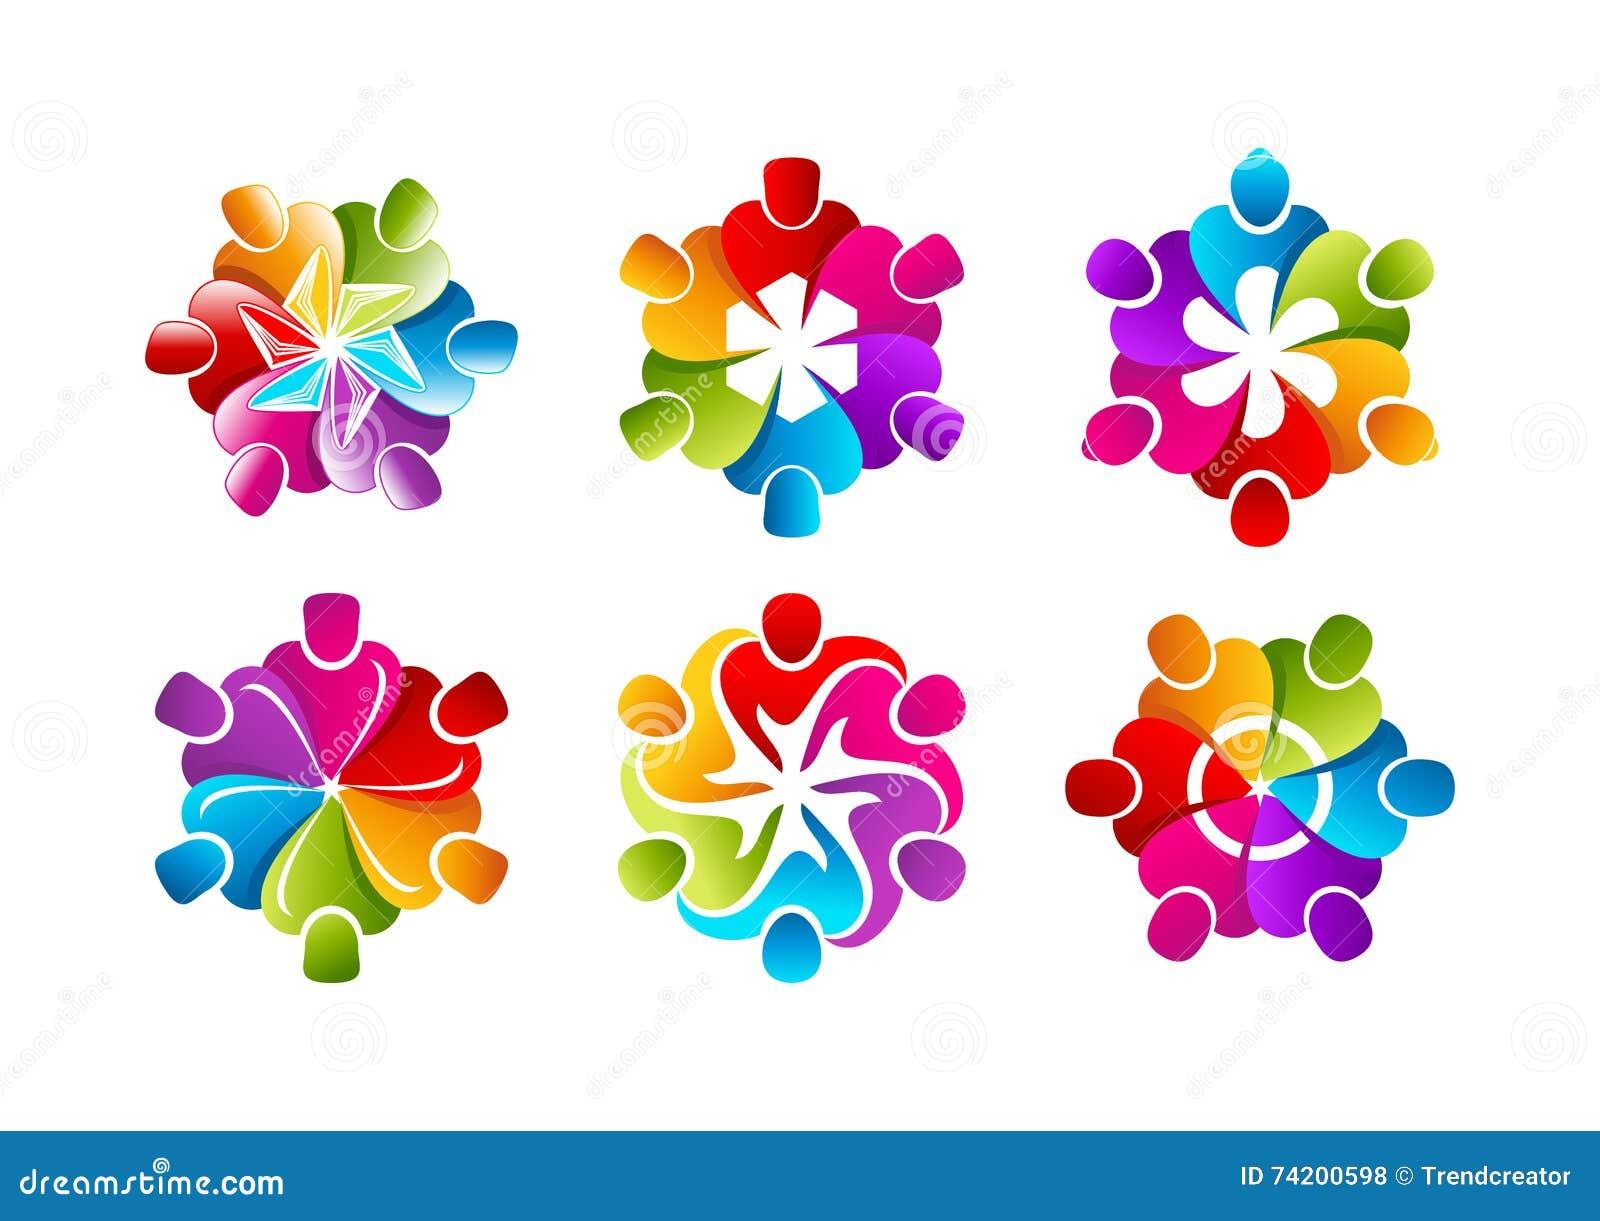 Teamwork logo, businessman symbol, creative people icon, professional community concept design